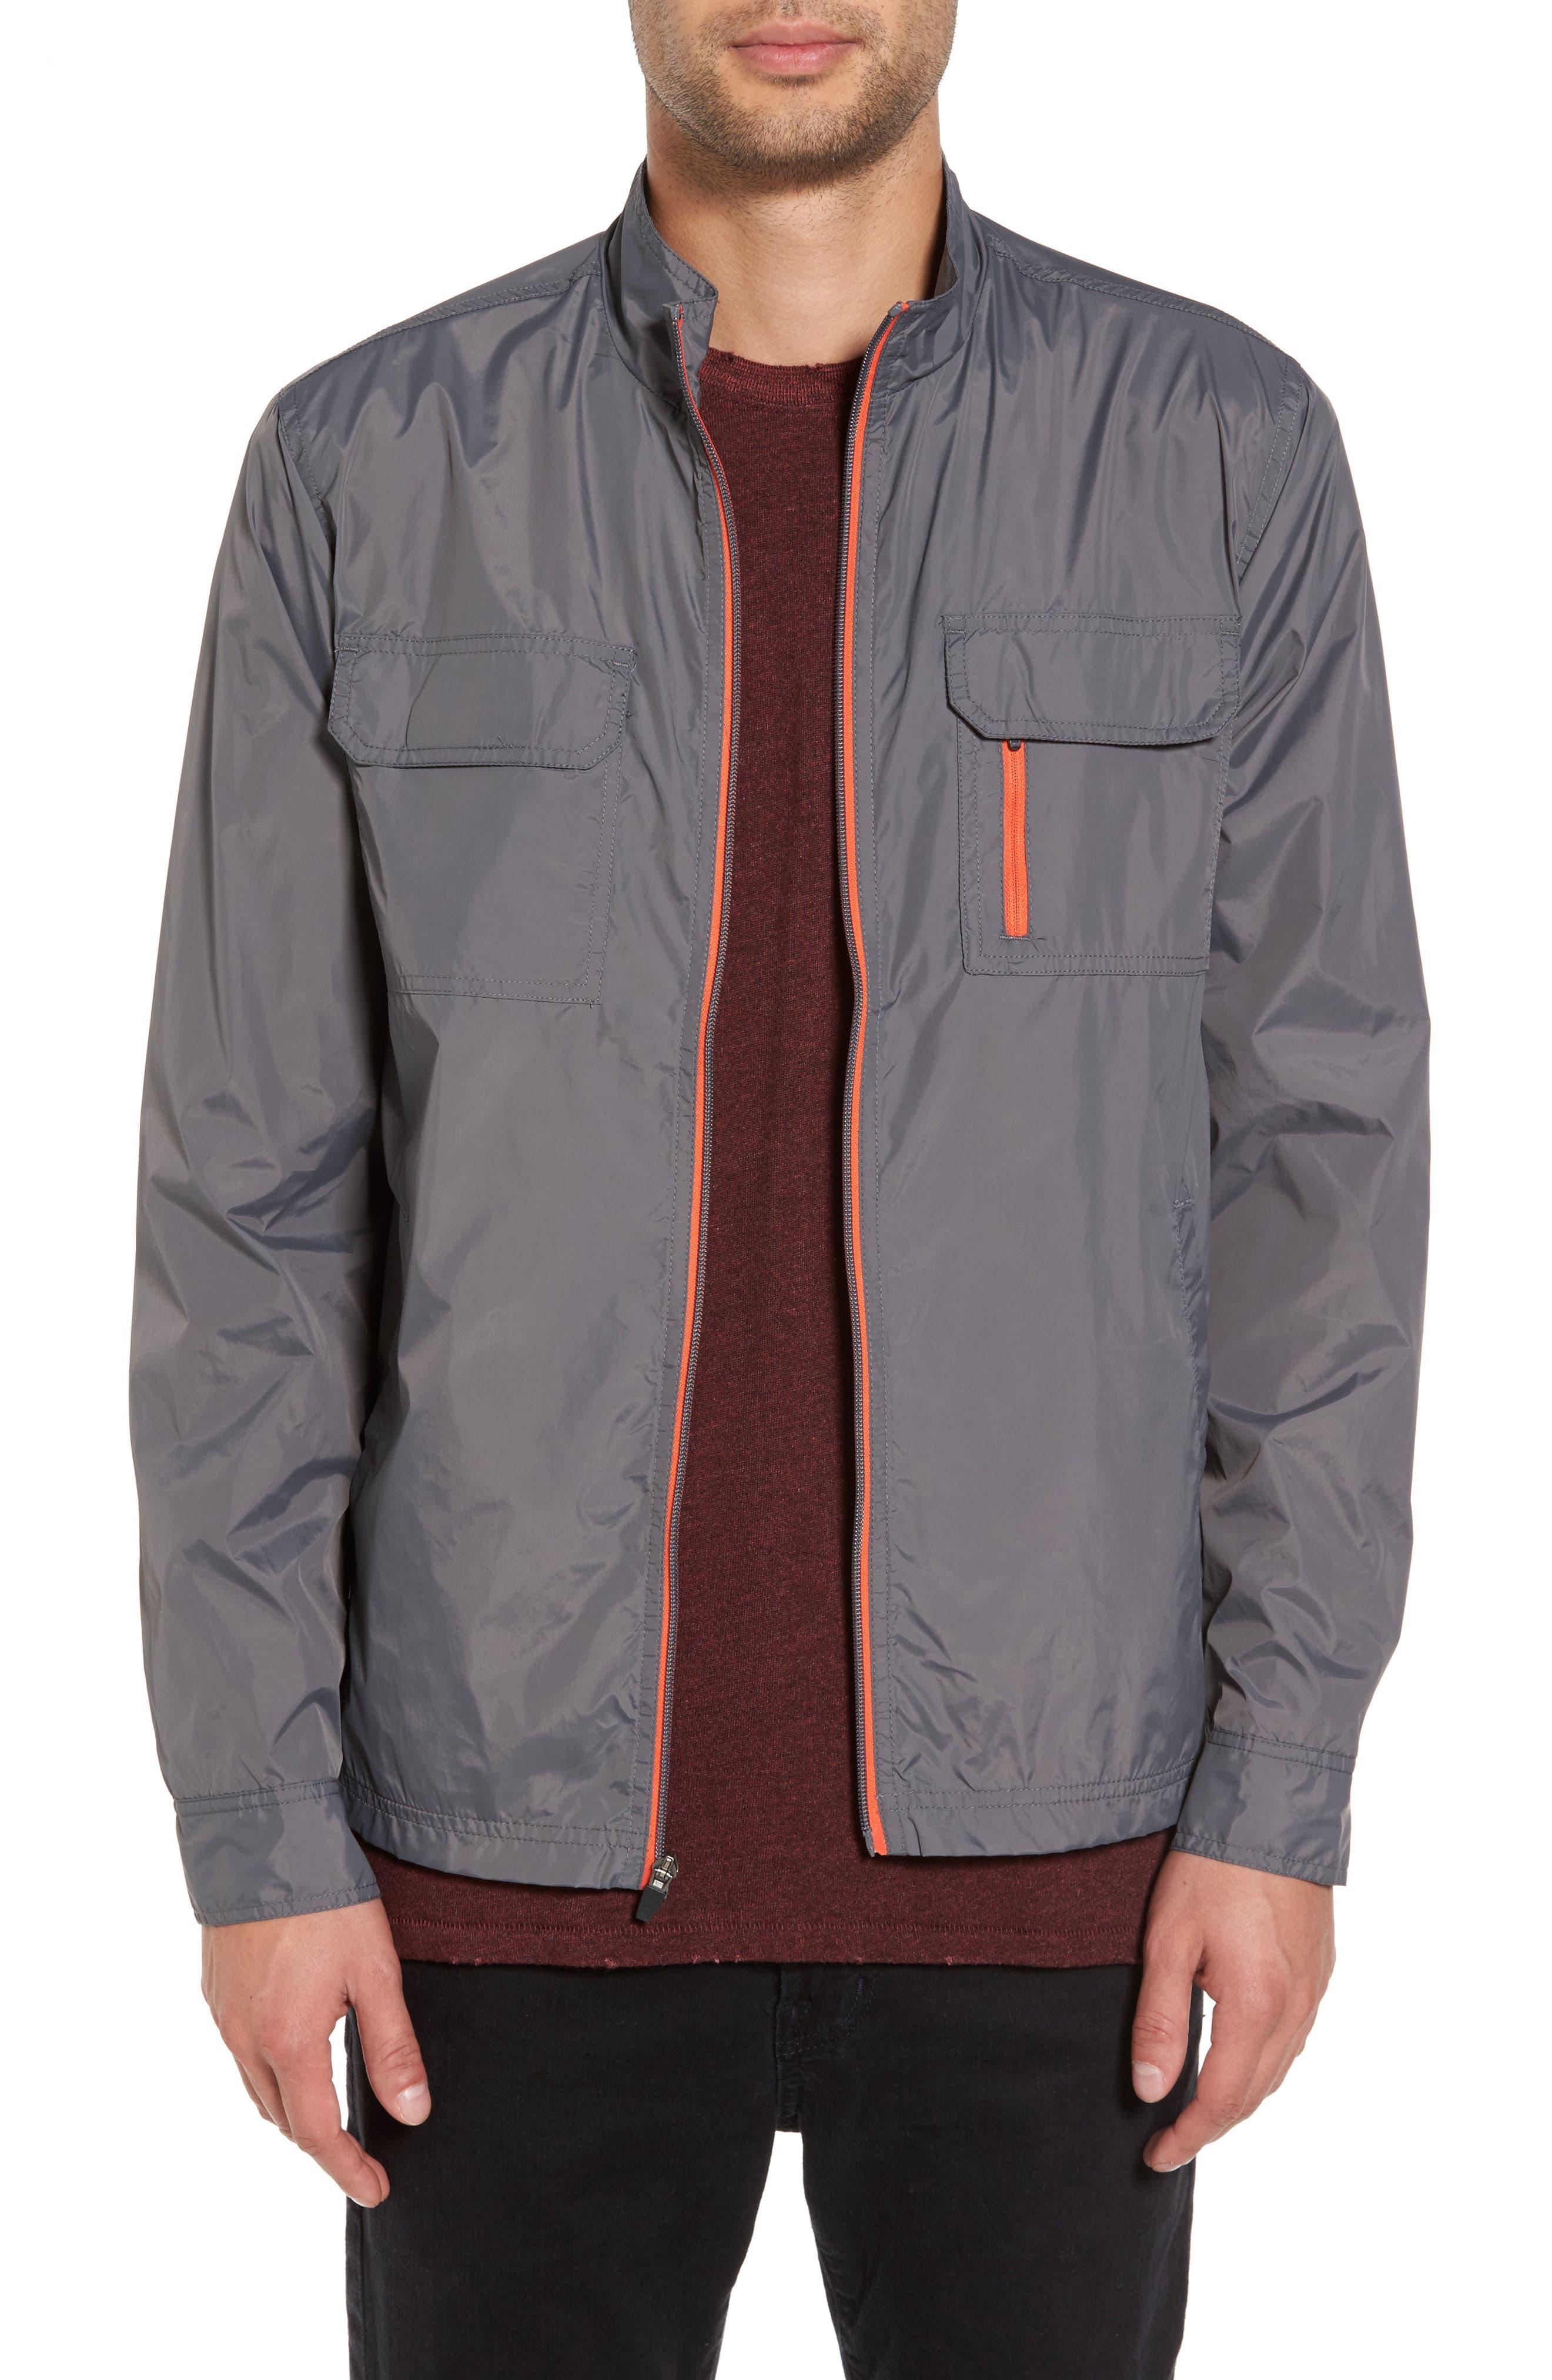 Staple Jacket,                             Main thumbnail 1, color,                             Grey